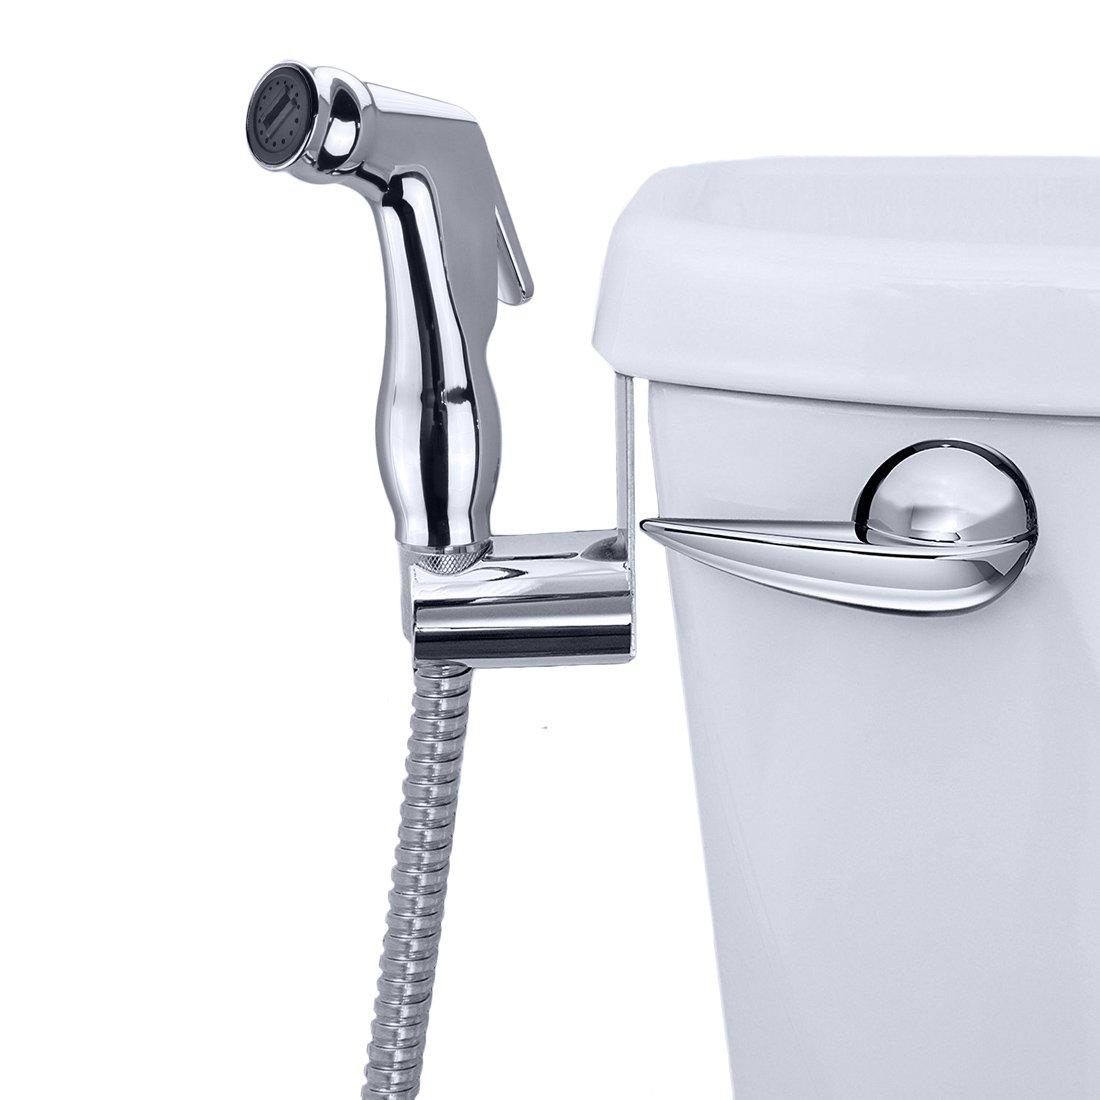 Lef Toilette Bad Bidet Washable Bidet Handbrause Sprayer Wc